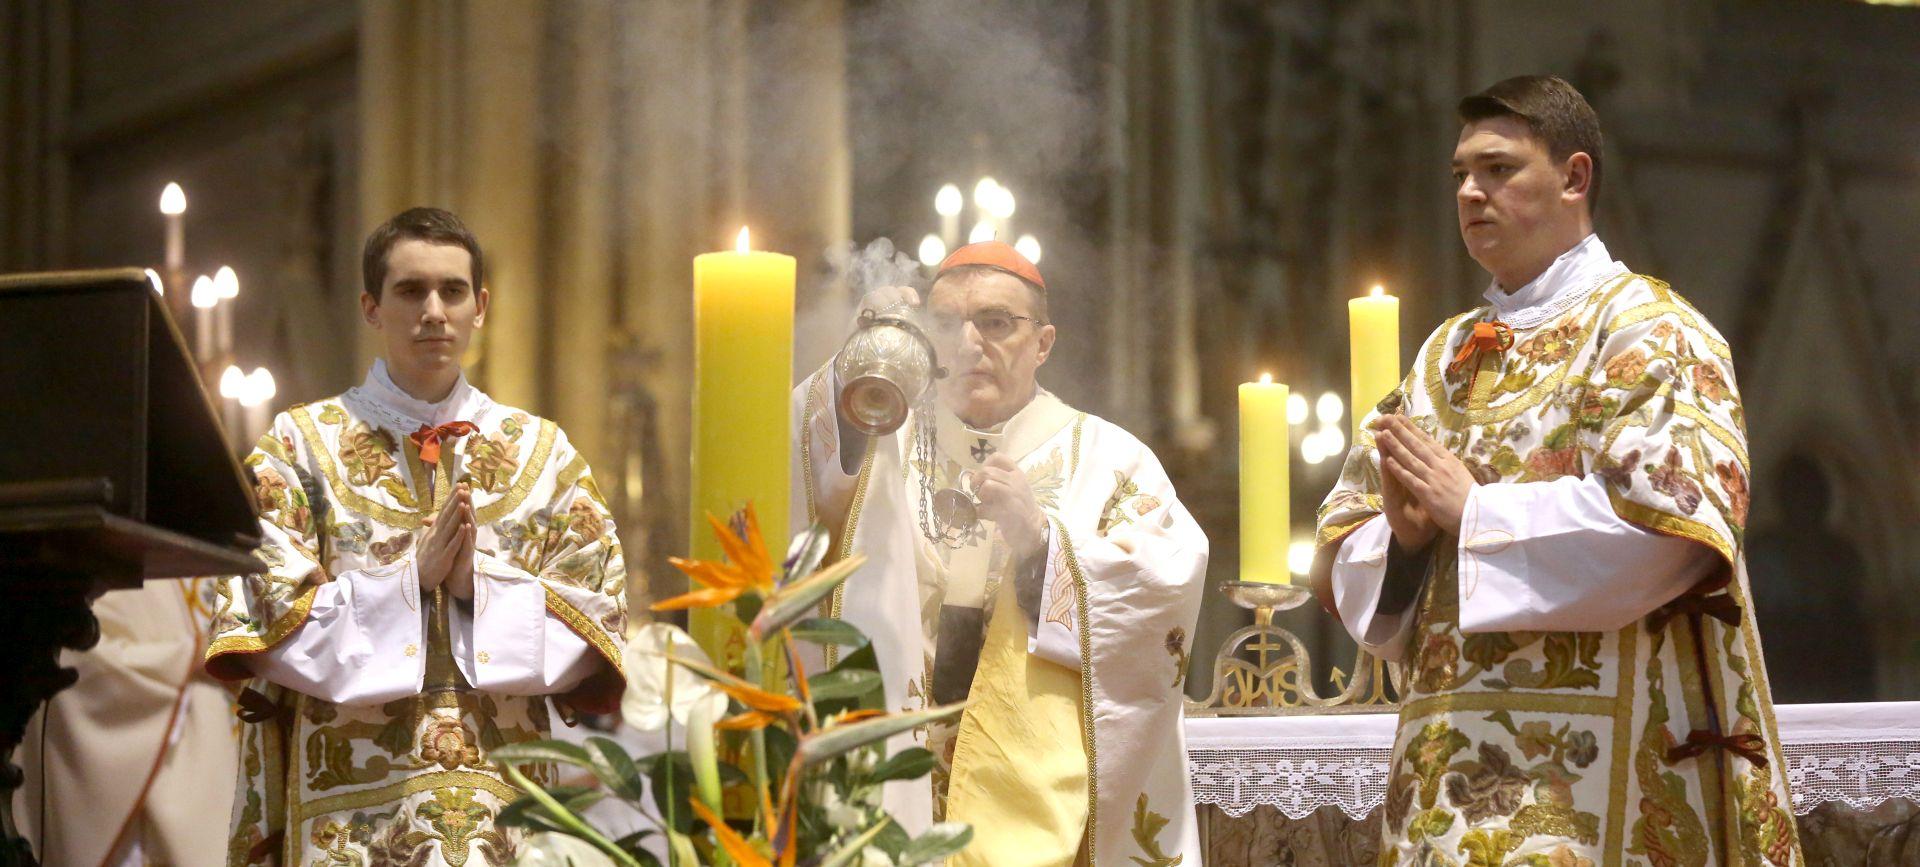 Bozanić pozvao na molitvu za Domovinu i obitelj